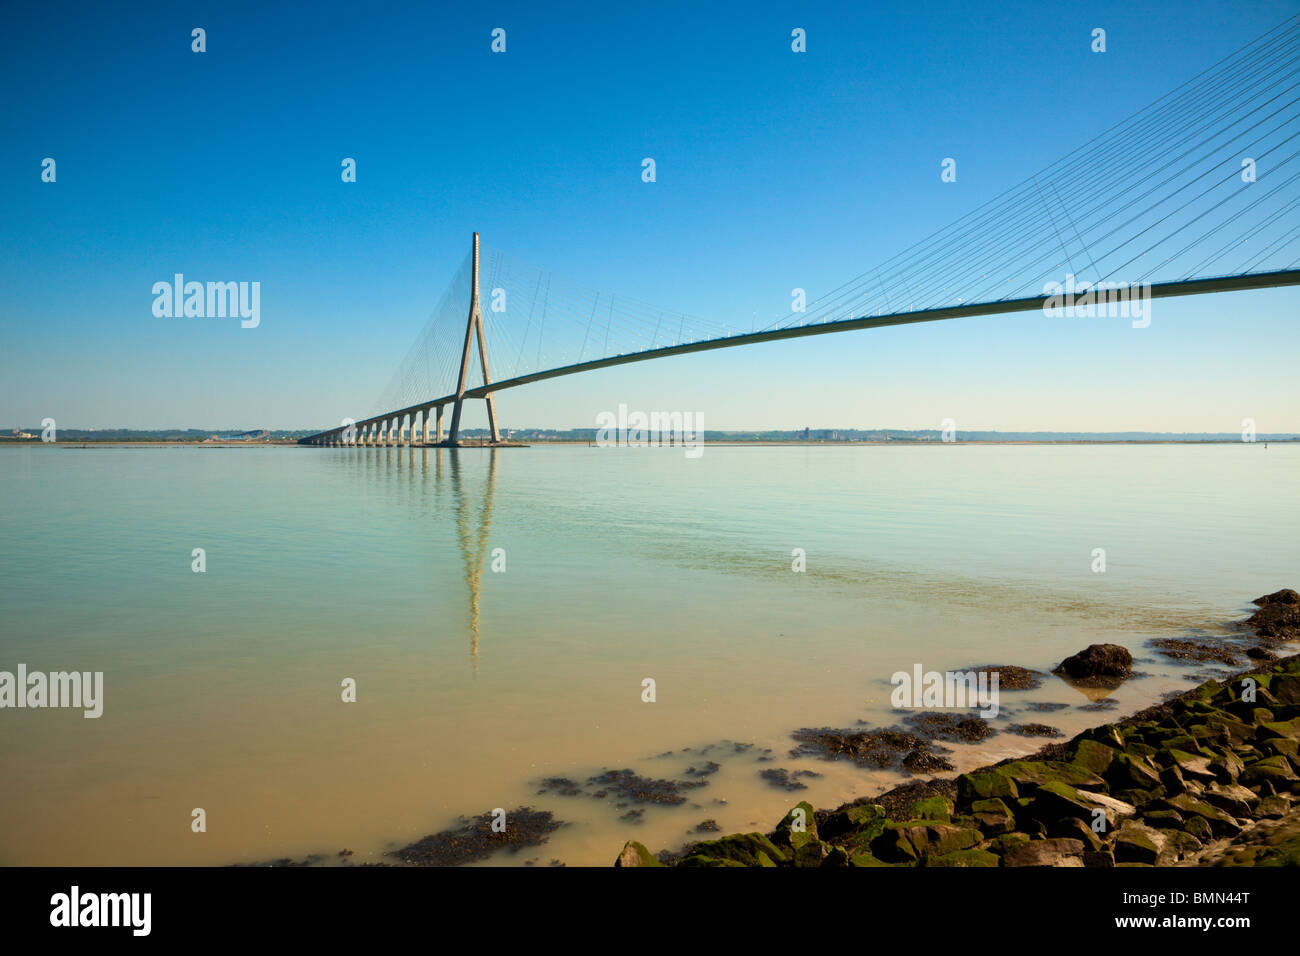 Pont de Normandie, il ponte che attraversa il fiume Senna da Le Havre a Honfleur Foto Stock